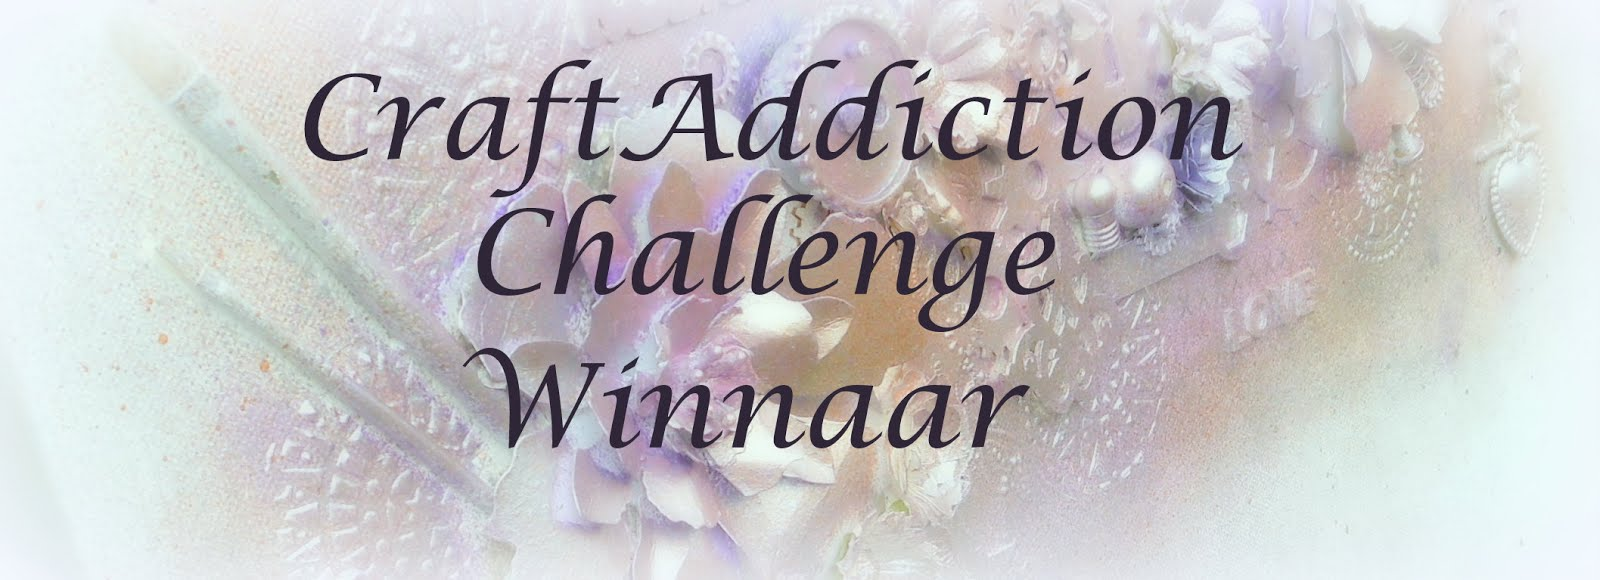 Crafaddiction Challenge Winnaar